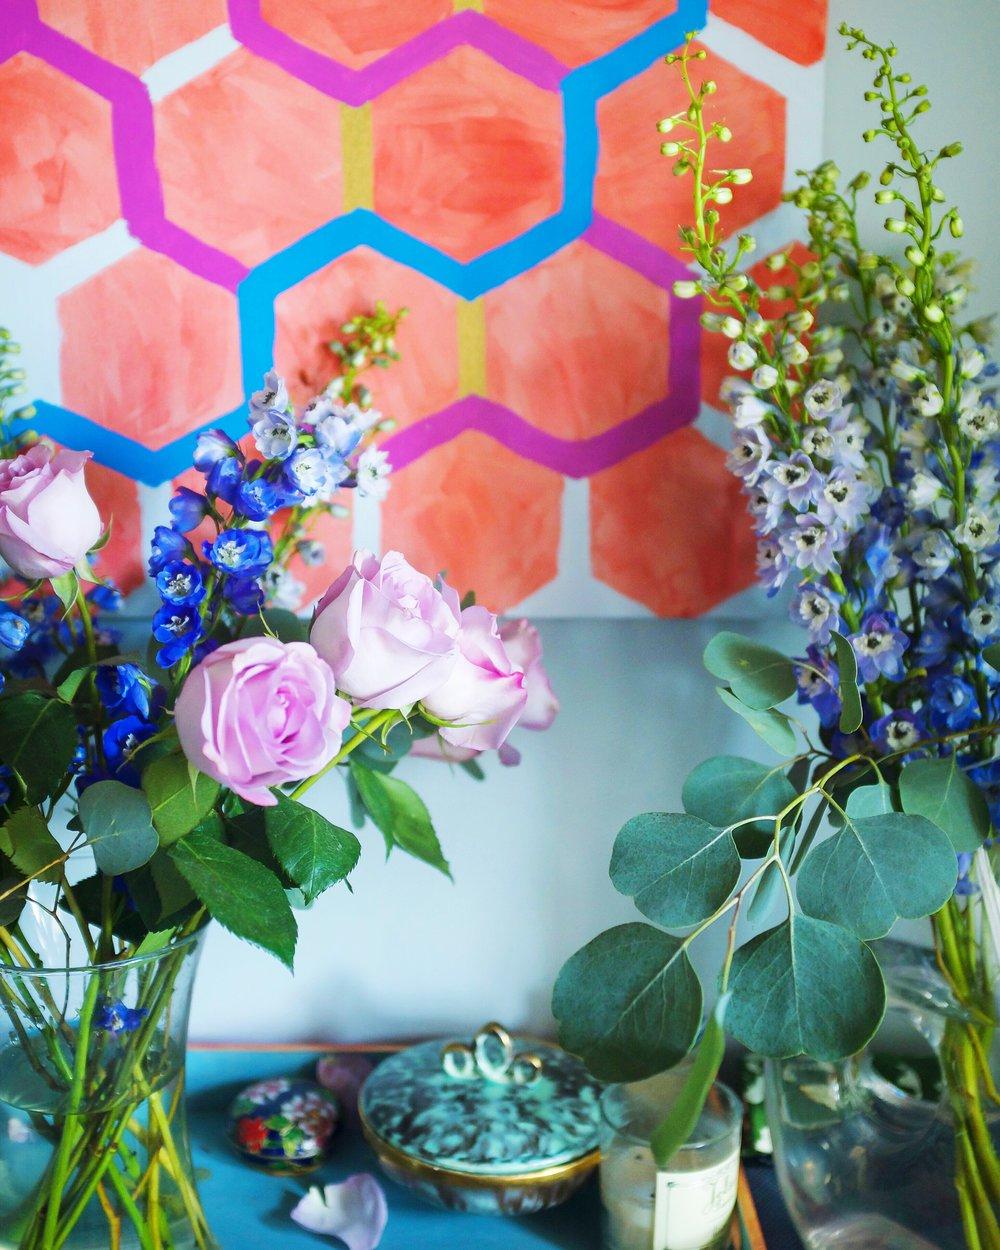 Clawmade_2016-07_Florals-RosesSnapdragonsJPG